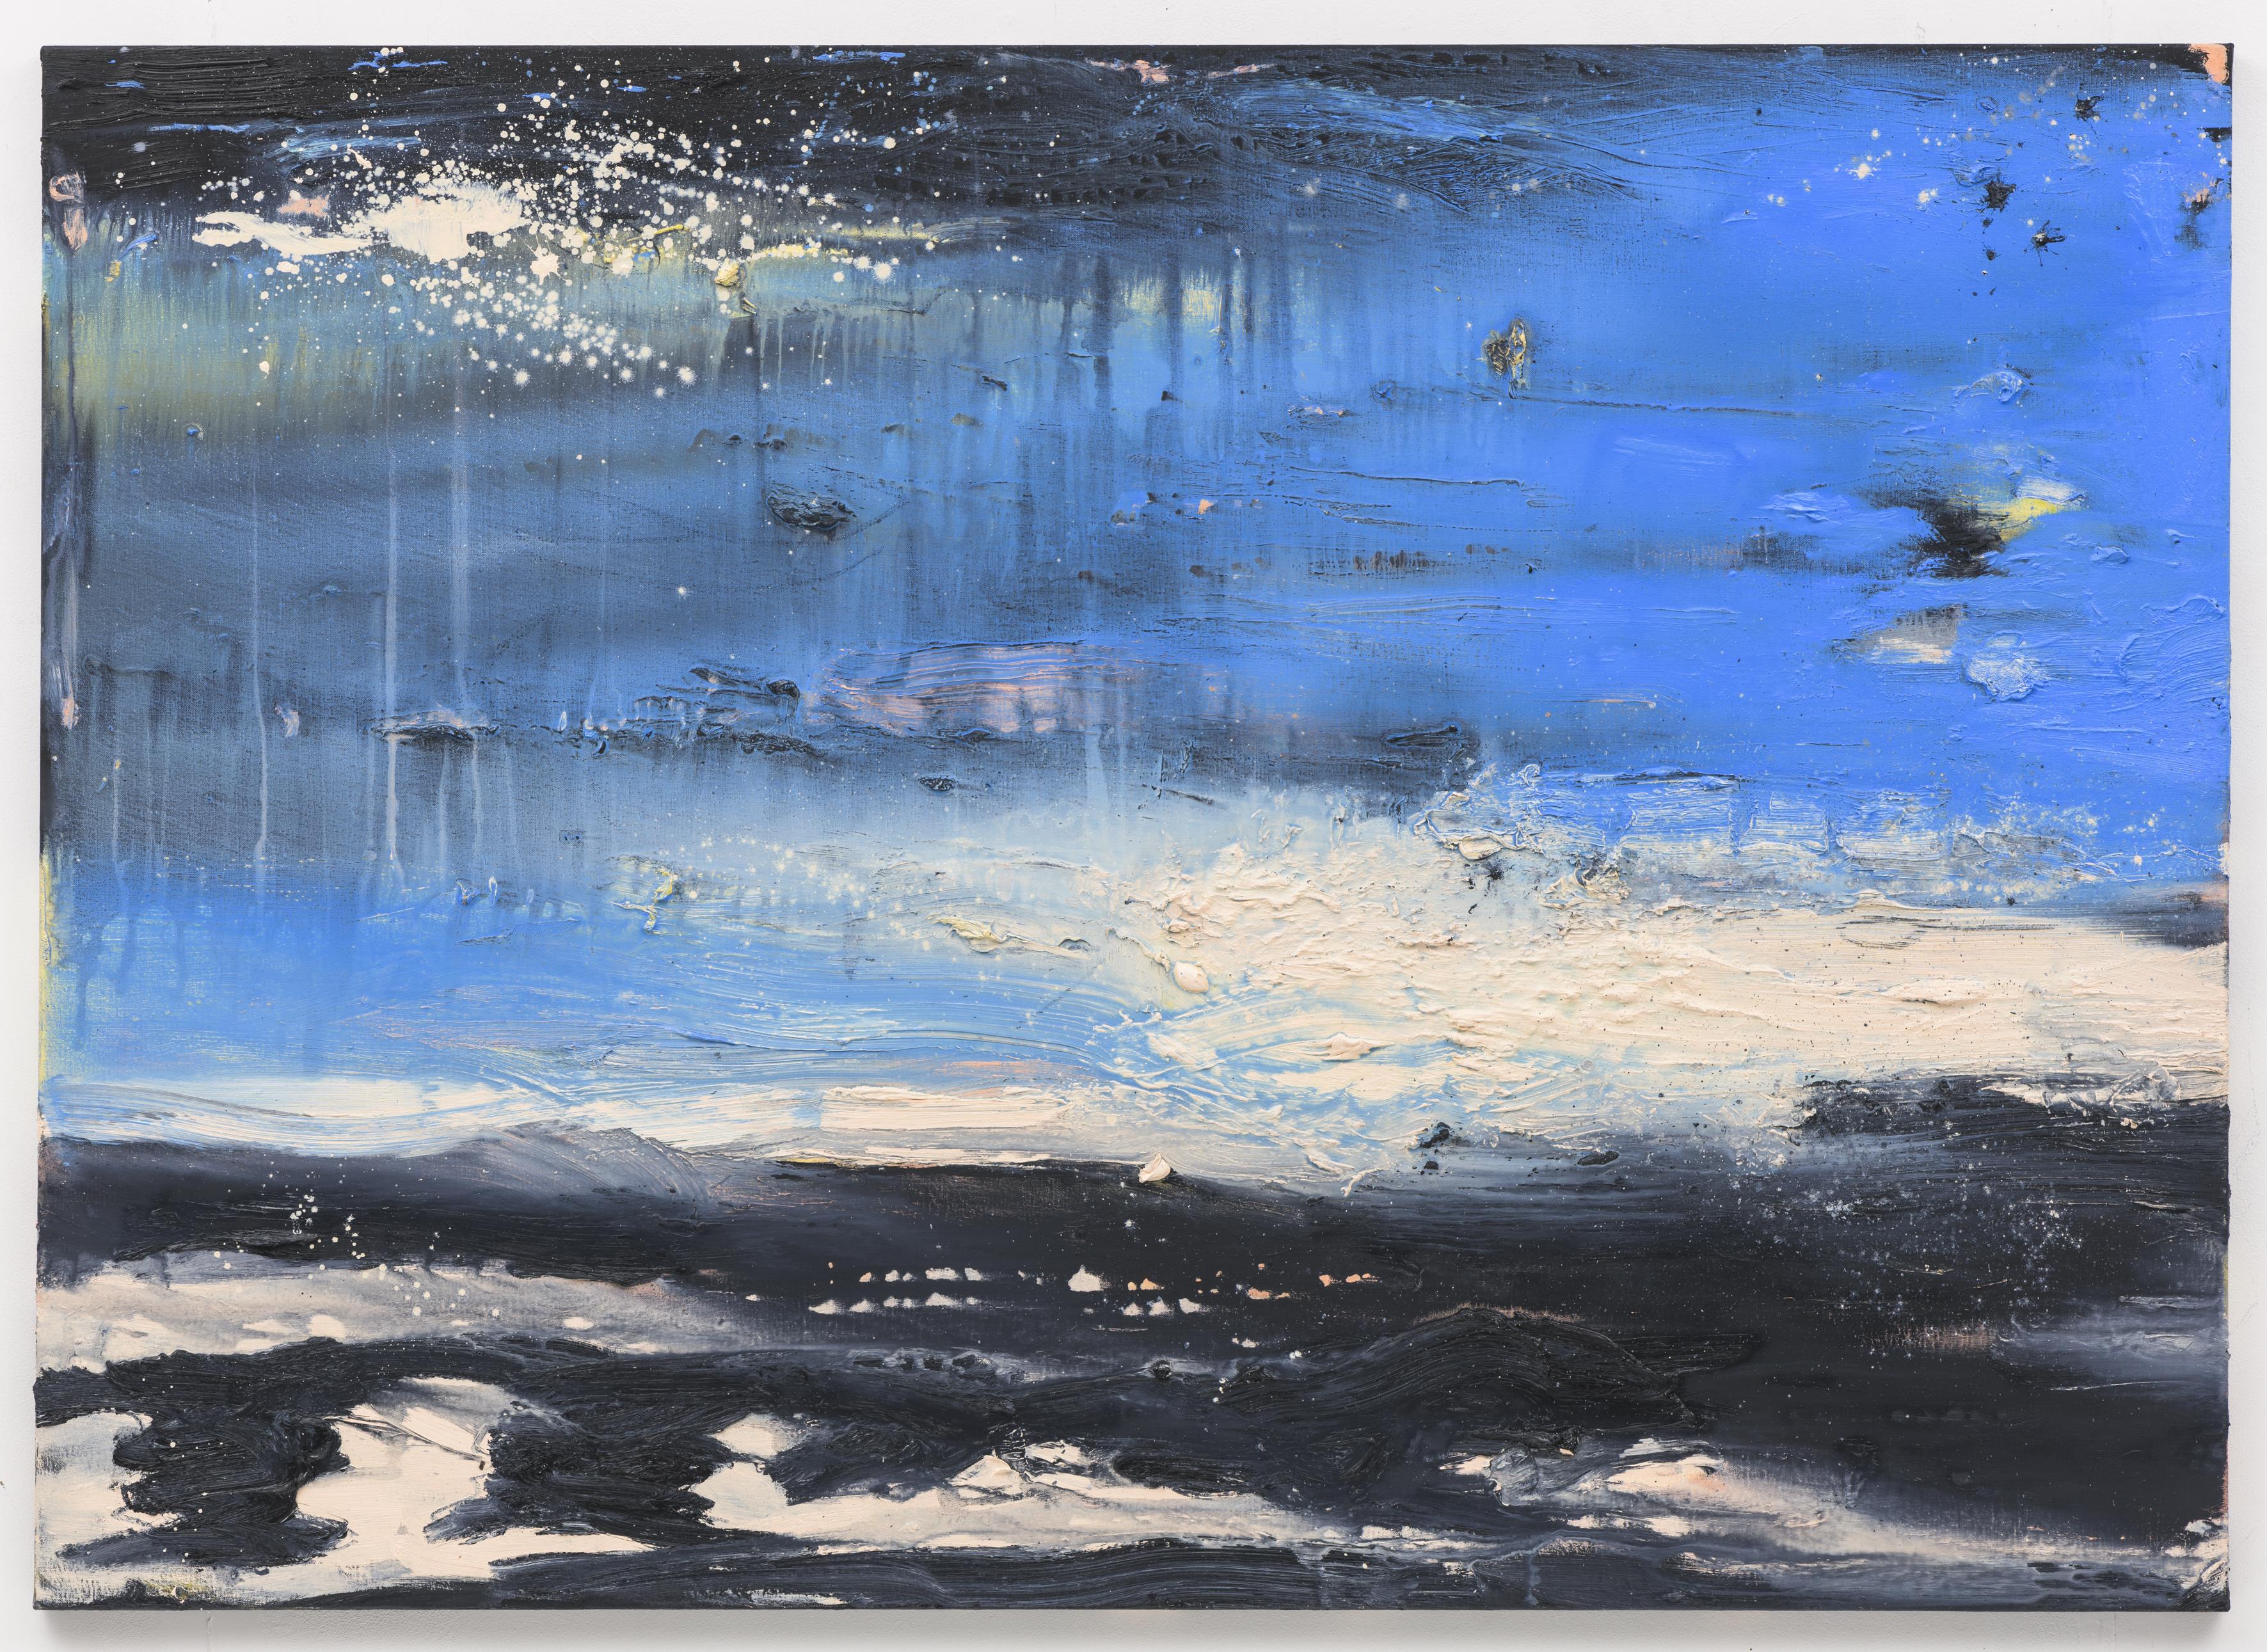 """Becalmed"", 100 x 140 cm. oil on linen 2018 (Berlin)"